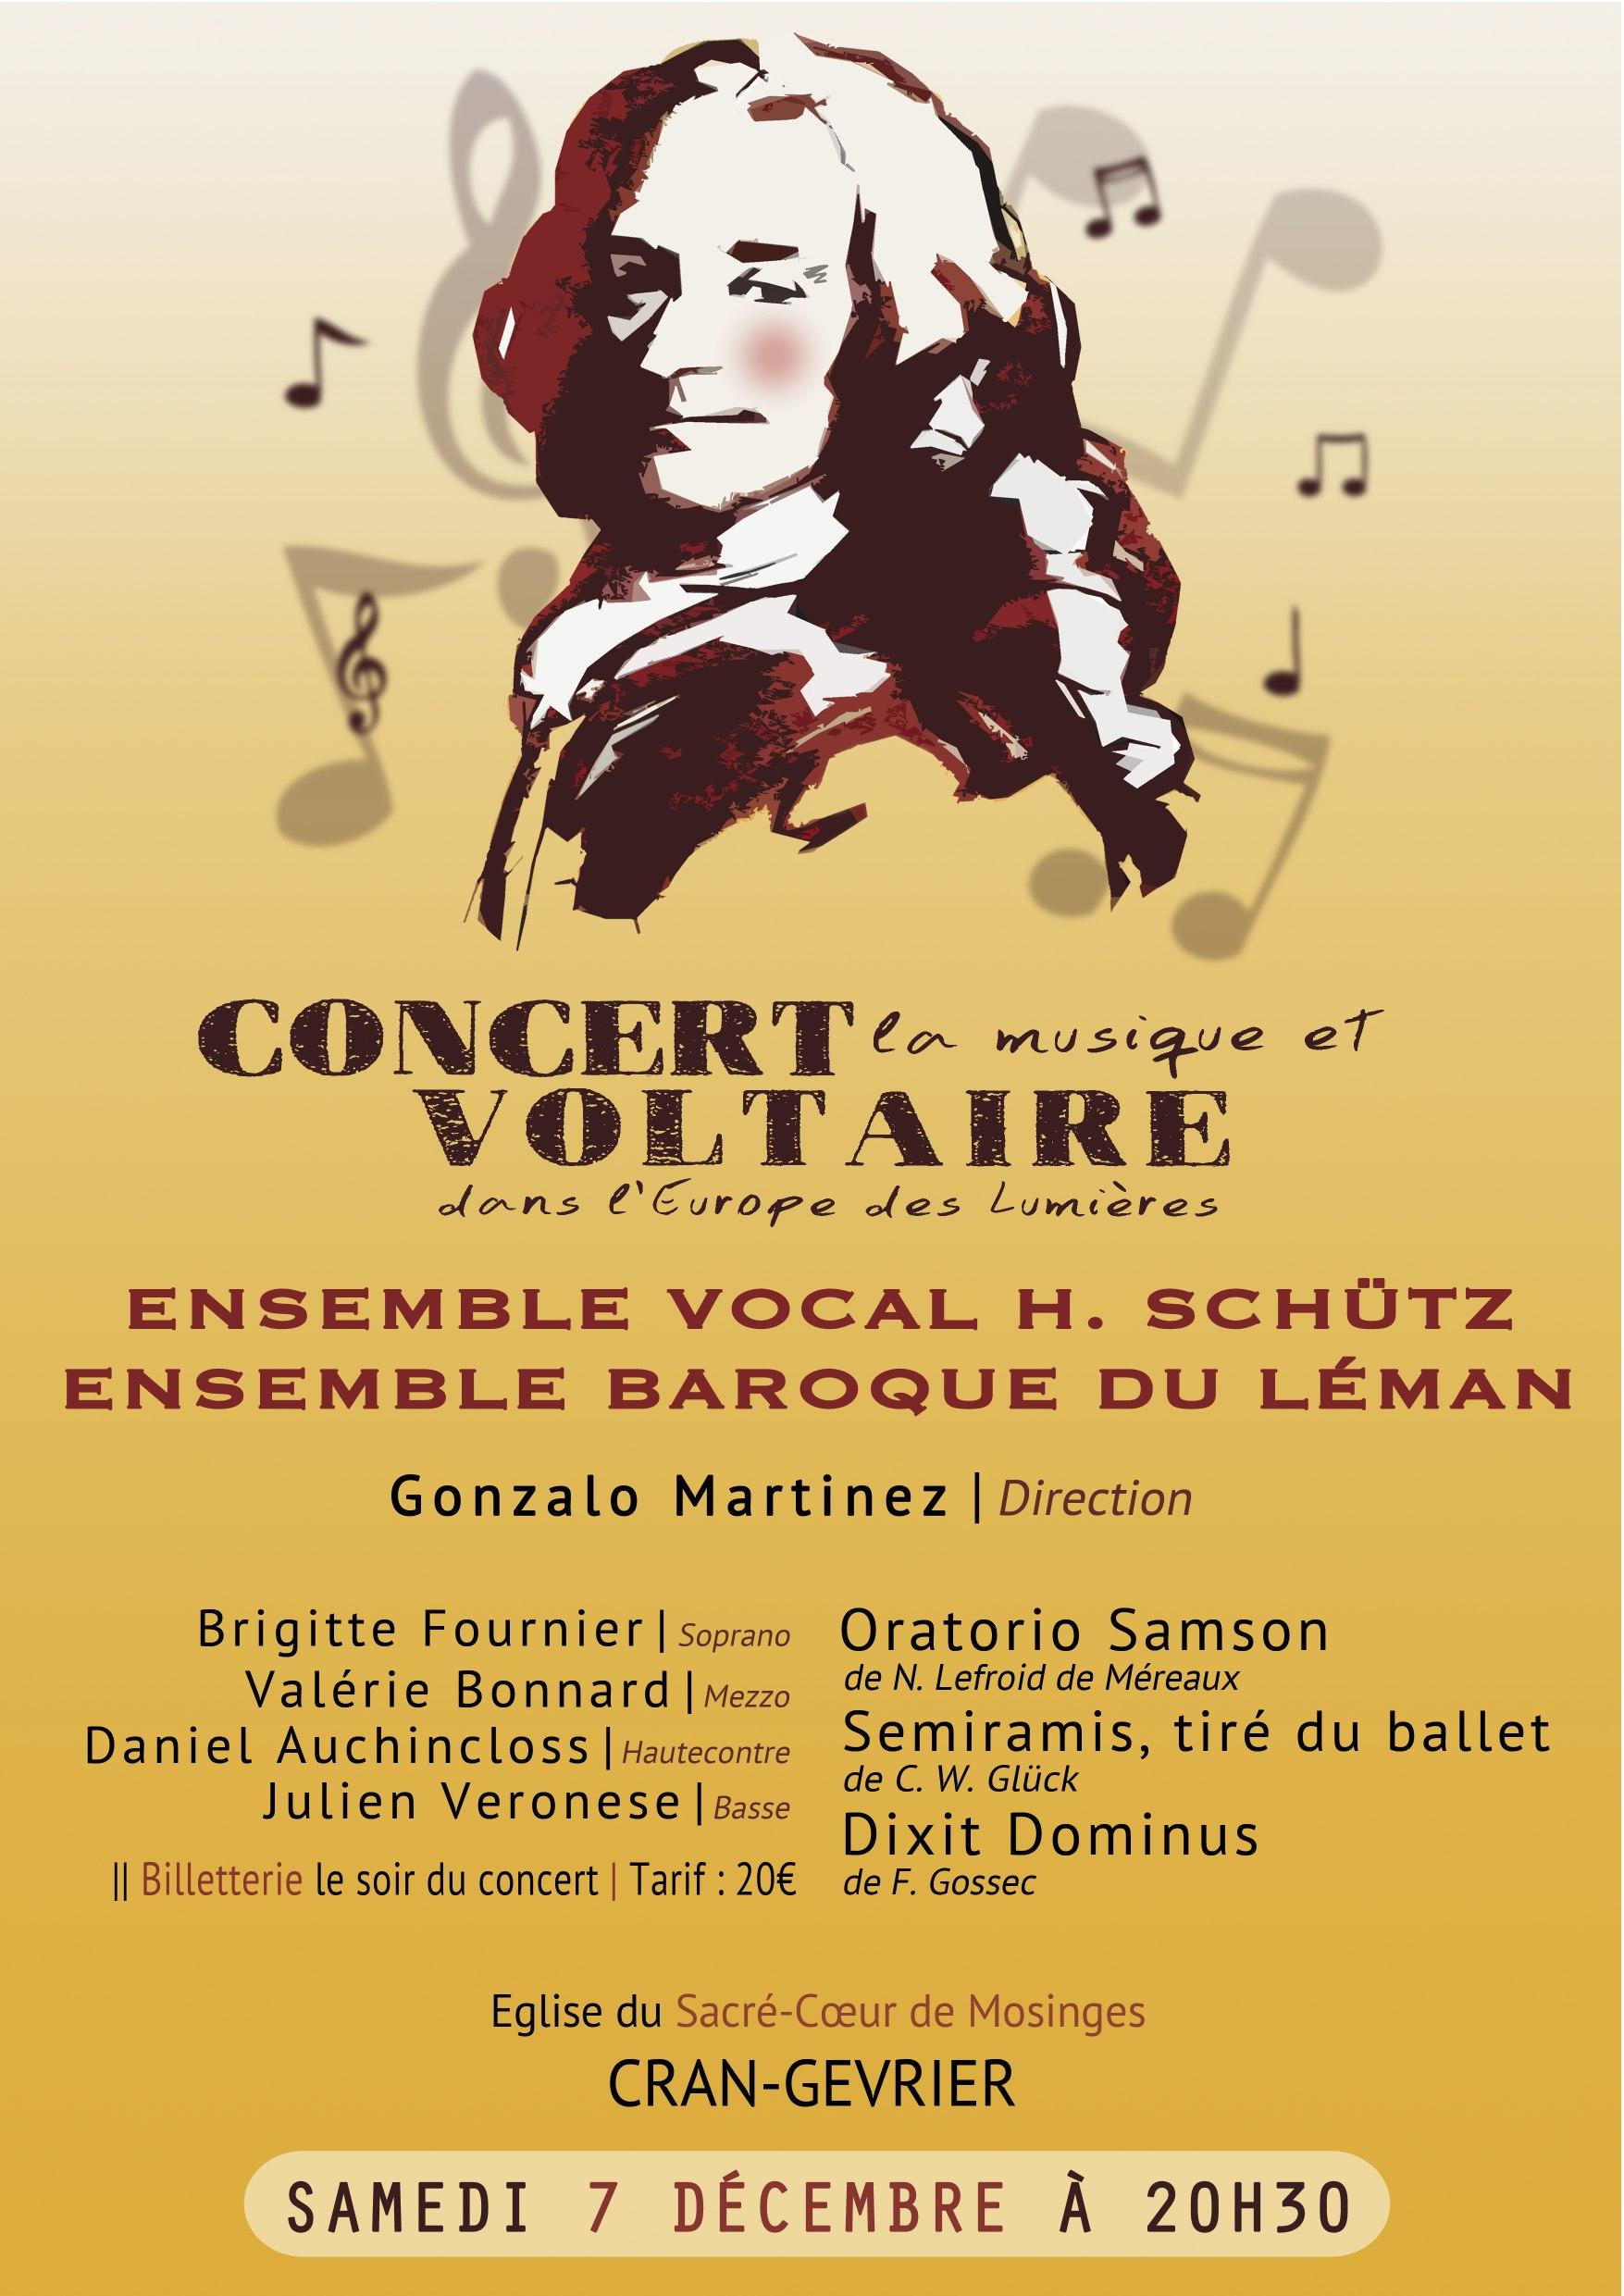 concert Voltaire